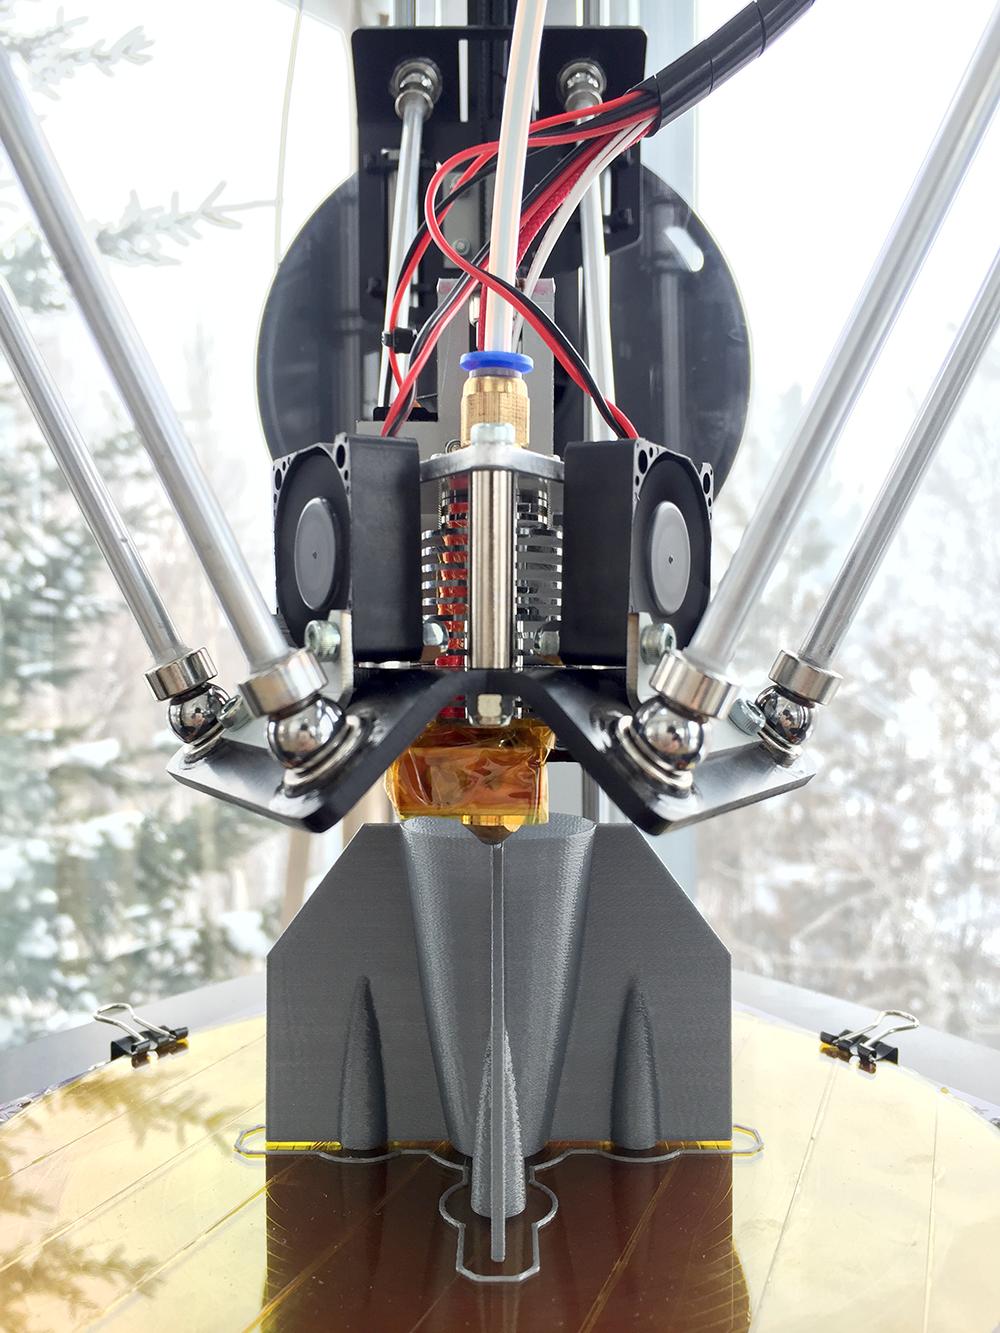 Trino2 3Dプリンター レンタル 基本使用料 - 画像2